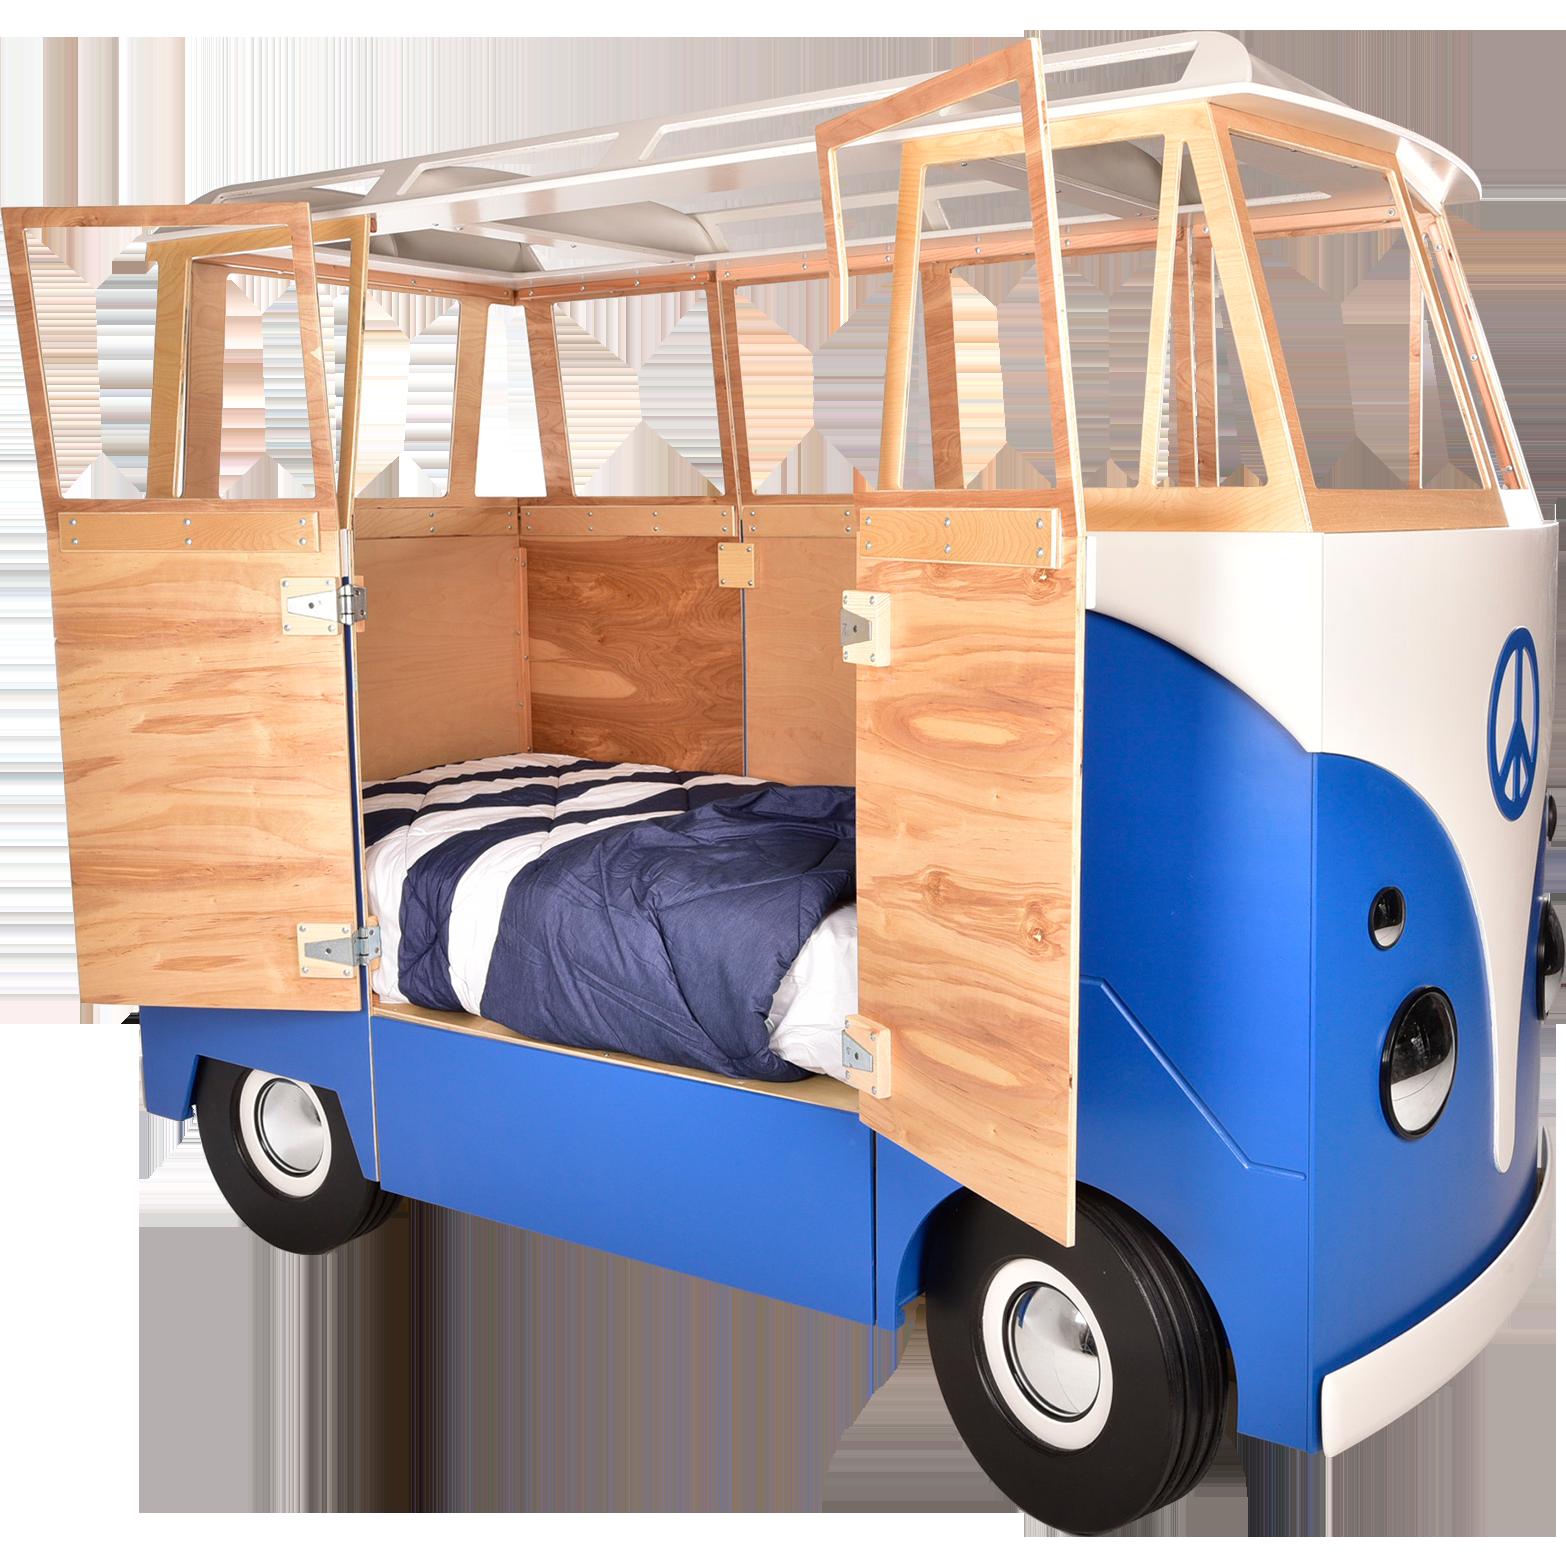 leon bus bed 01 1566x1566